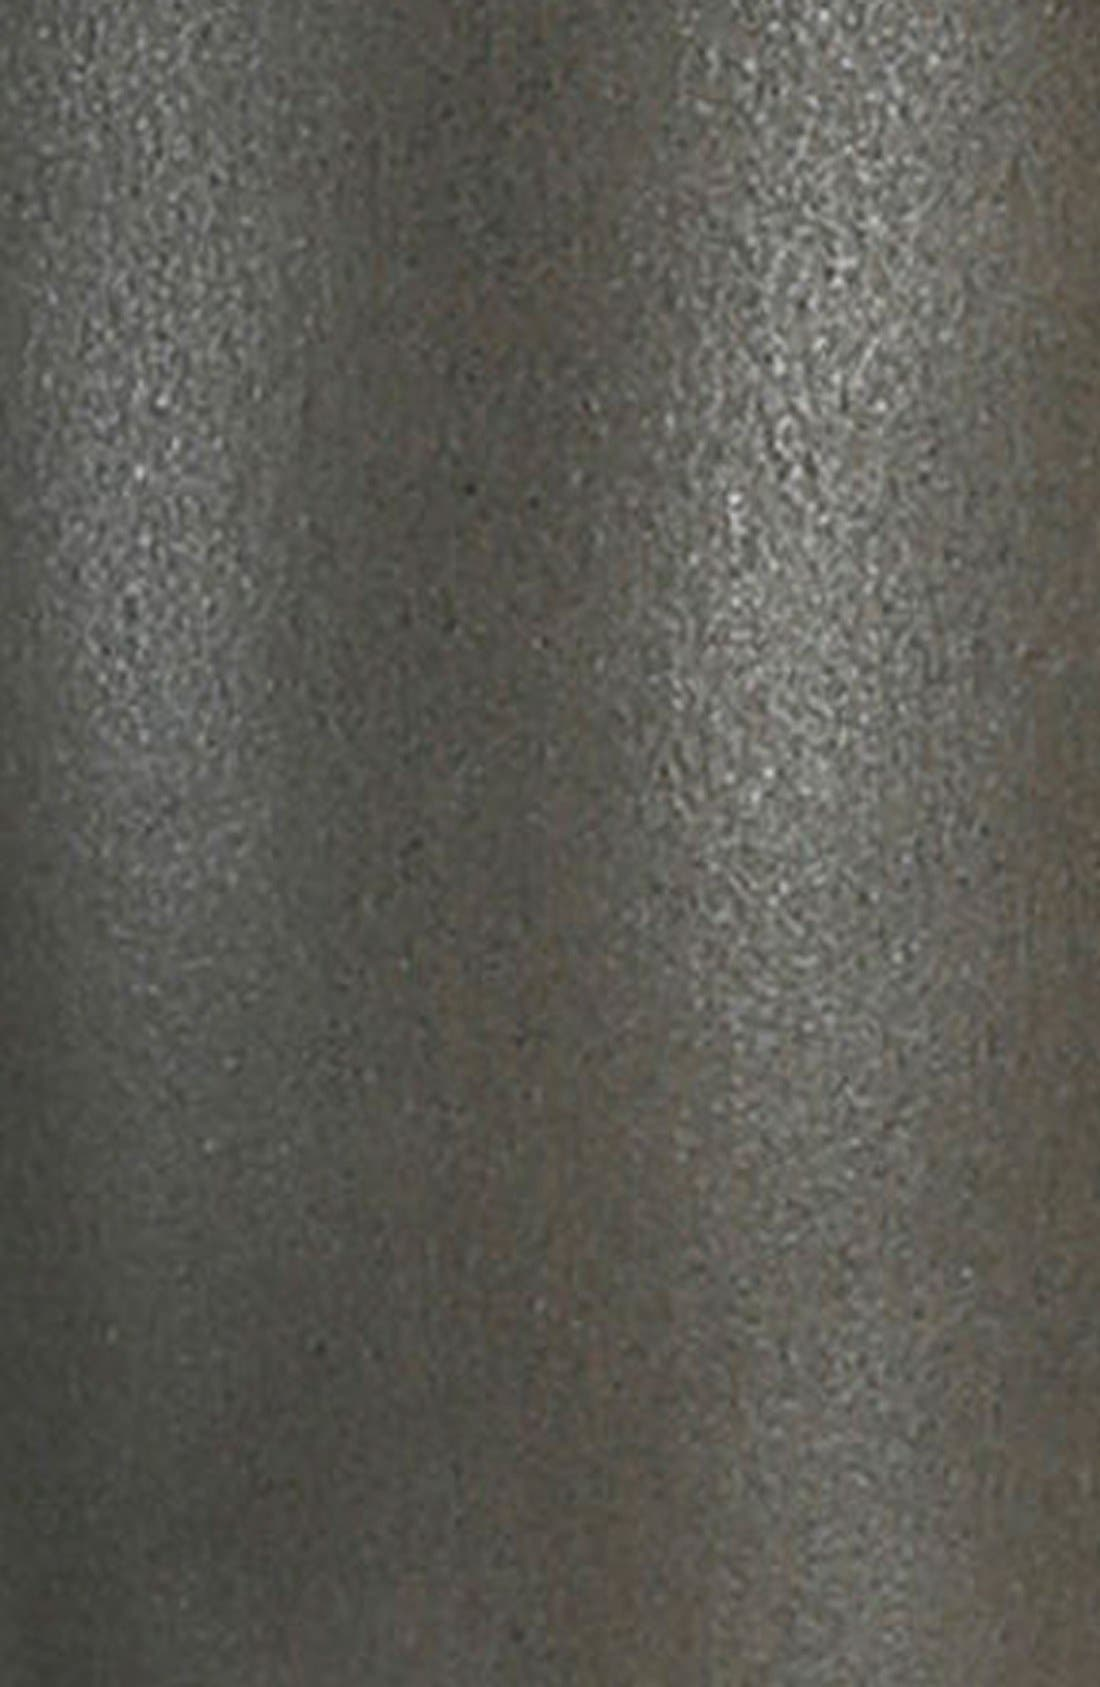 Transcend Verdugo Coated Ultra Skinny Jeans,                             Alternate thumbnail 5, color,                             300